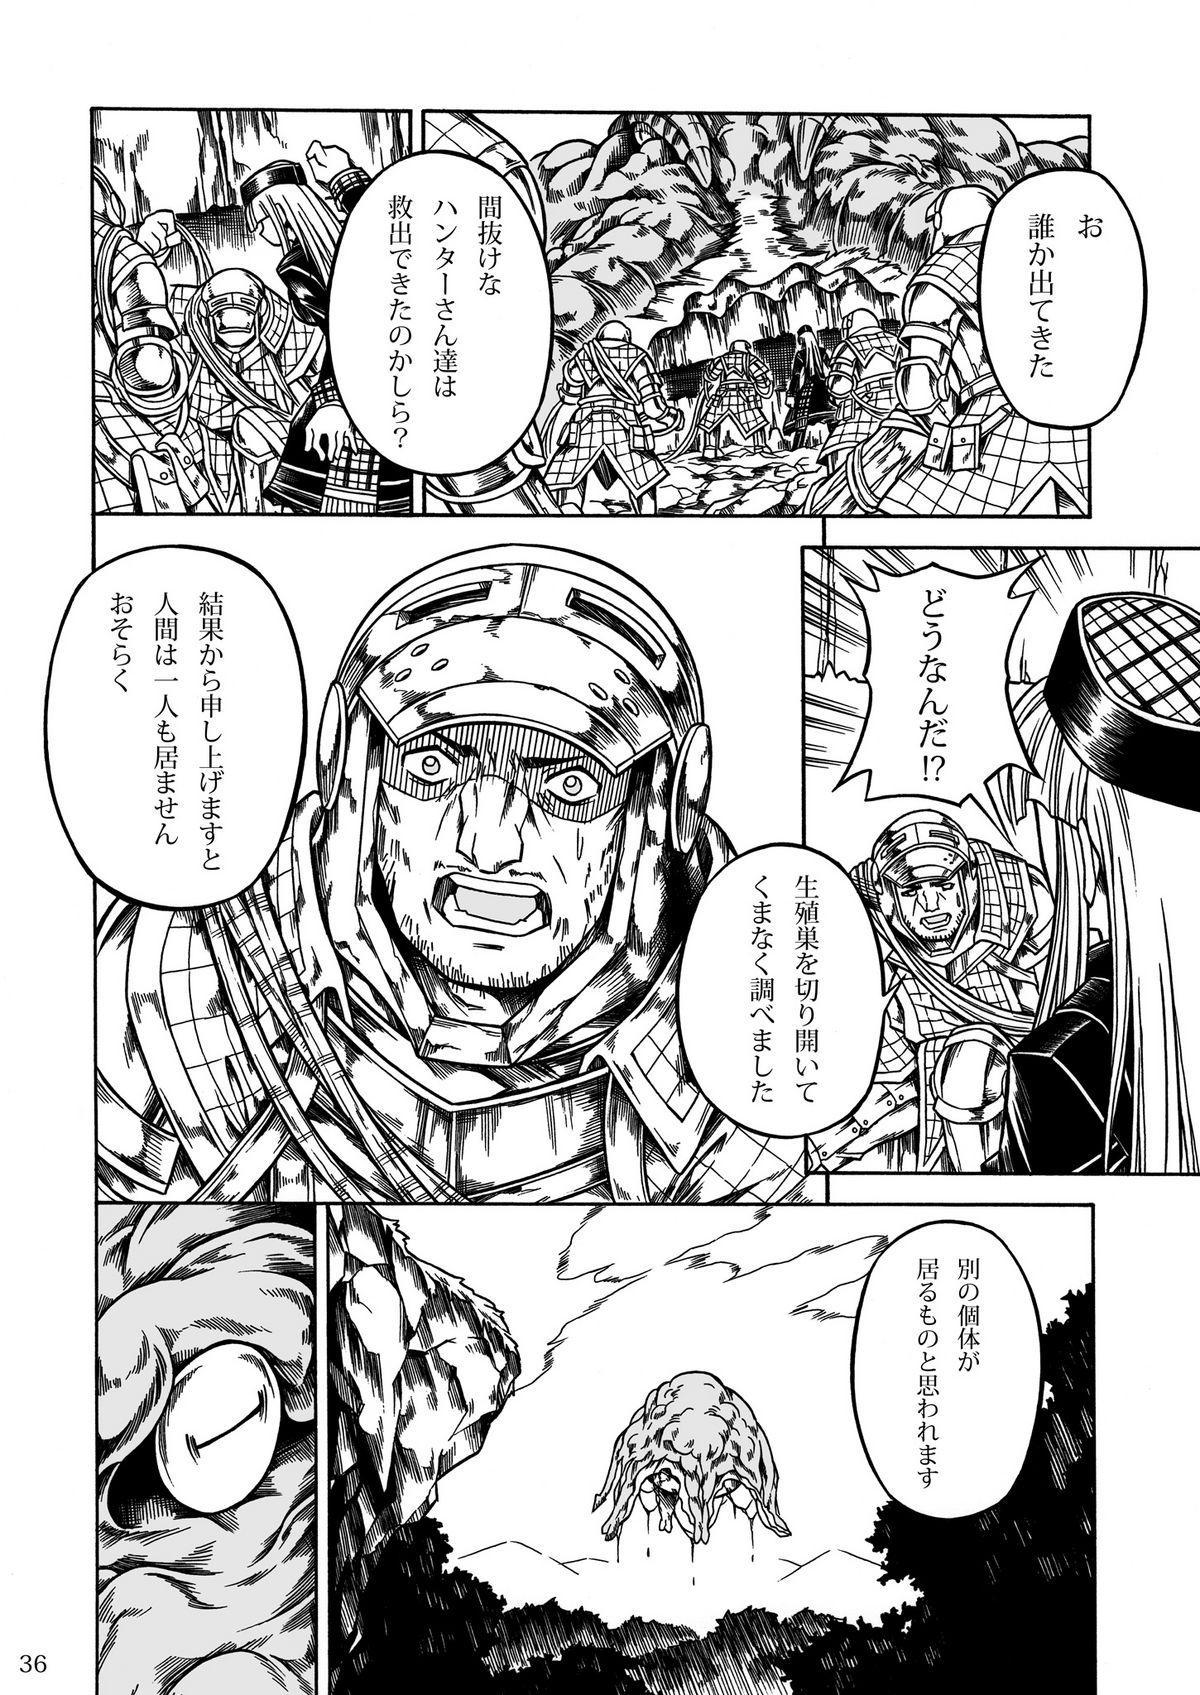 Solo Hunter no Seitai 2 The third part 35